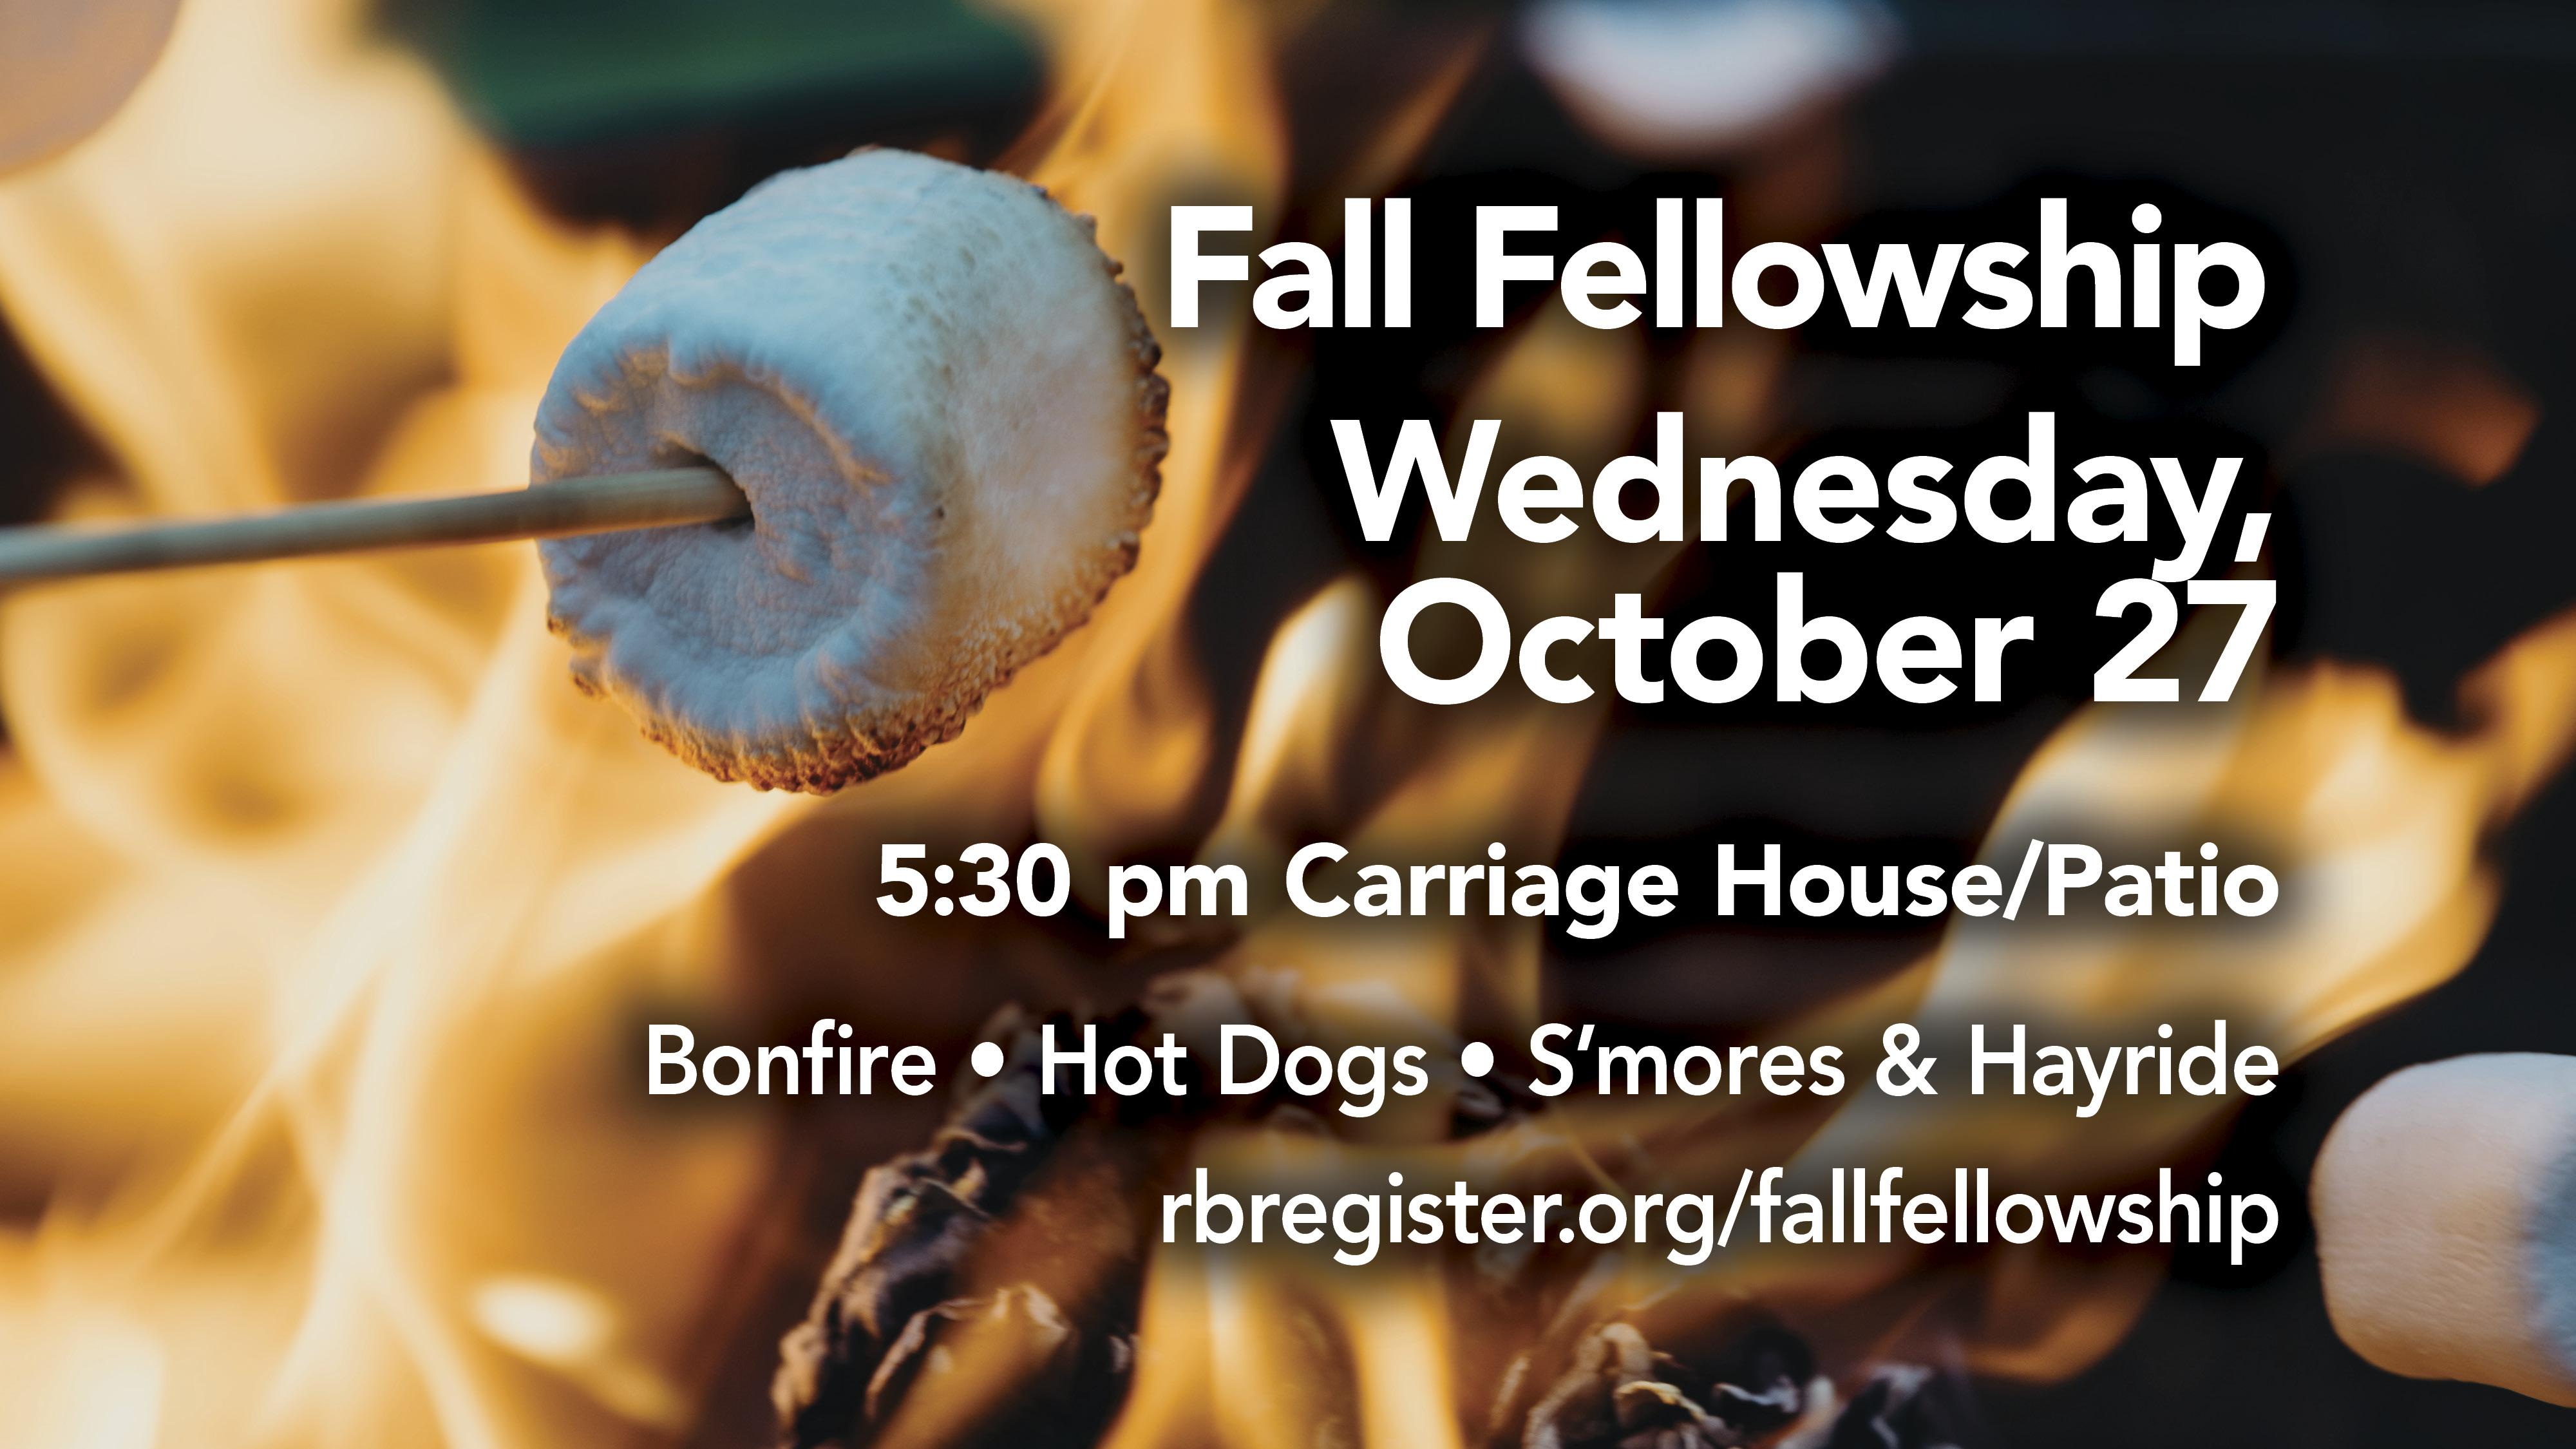 Fall Fellowship